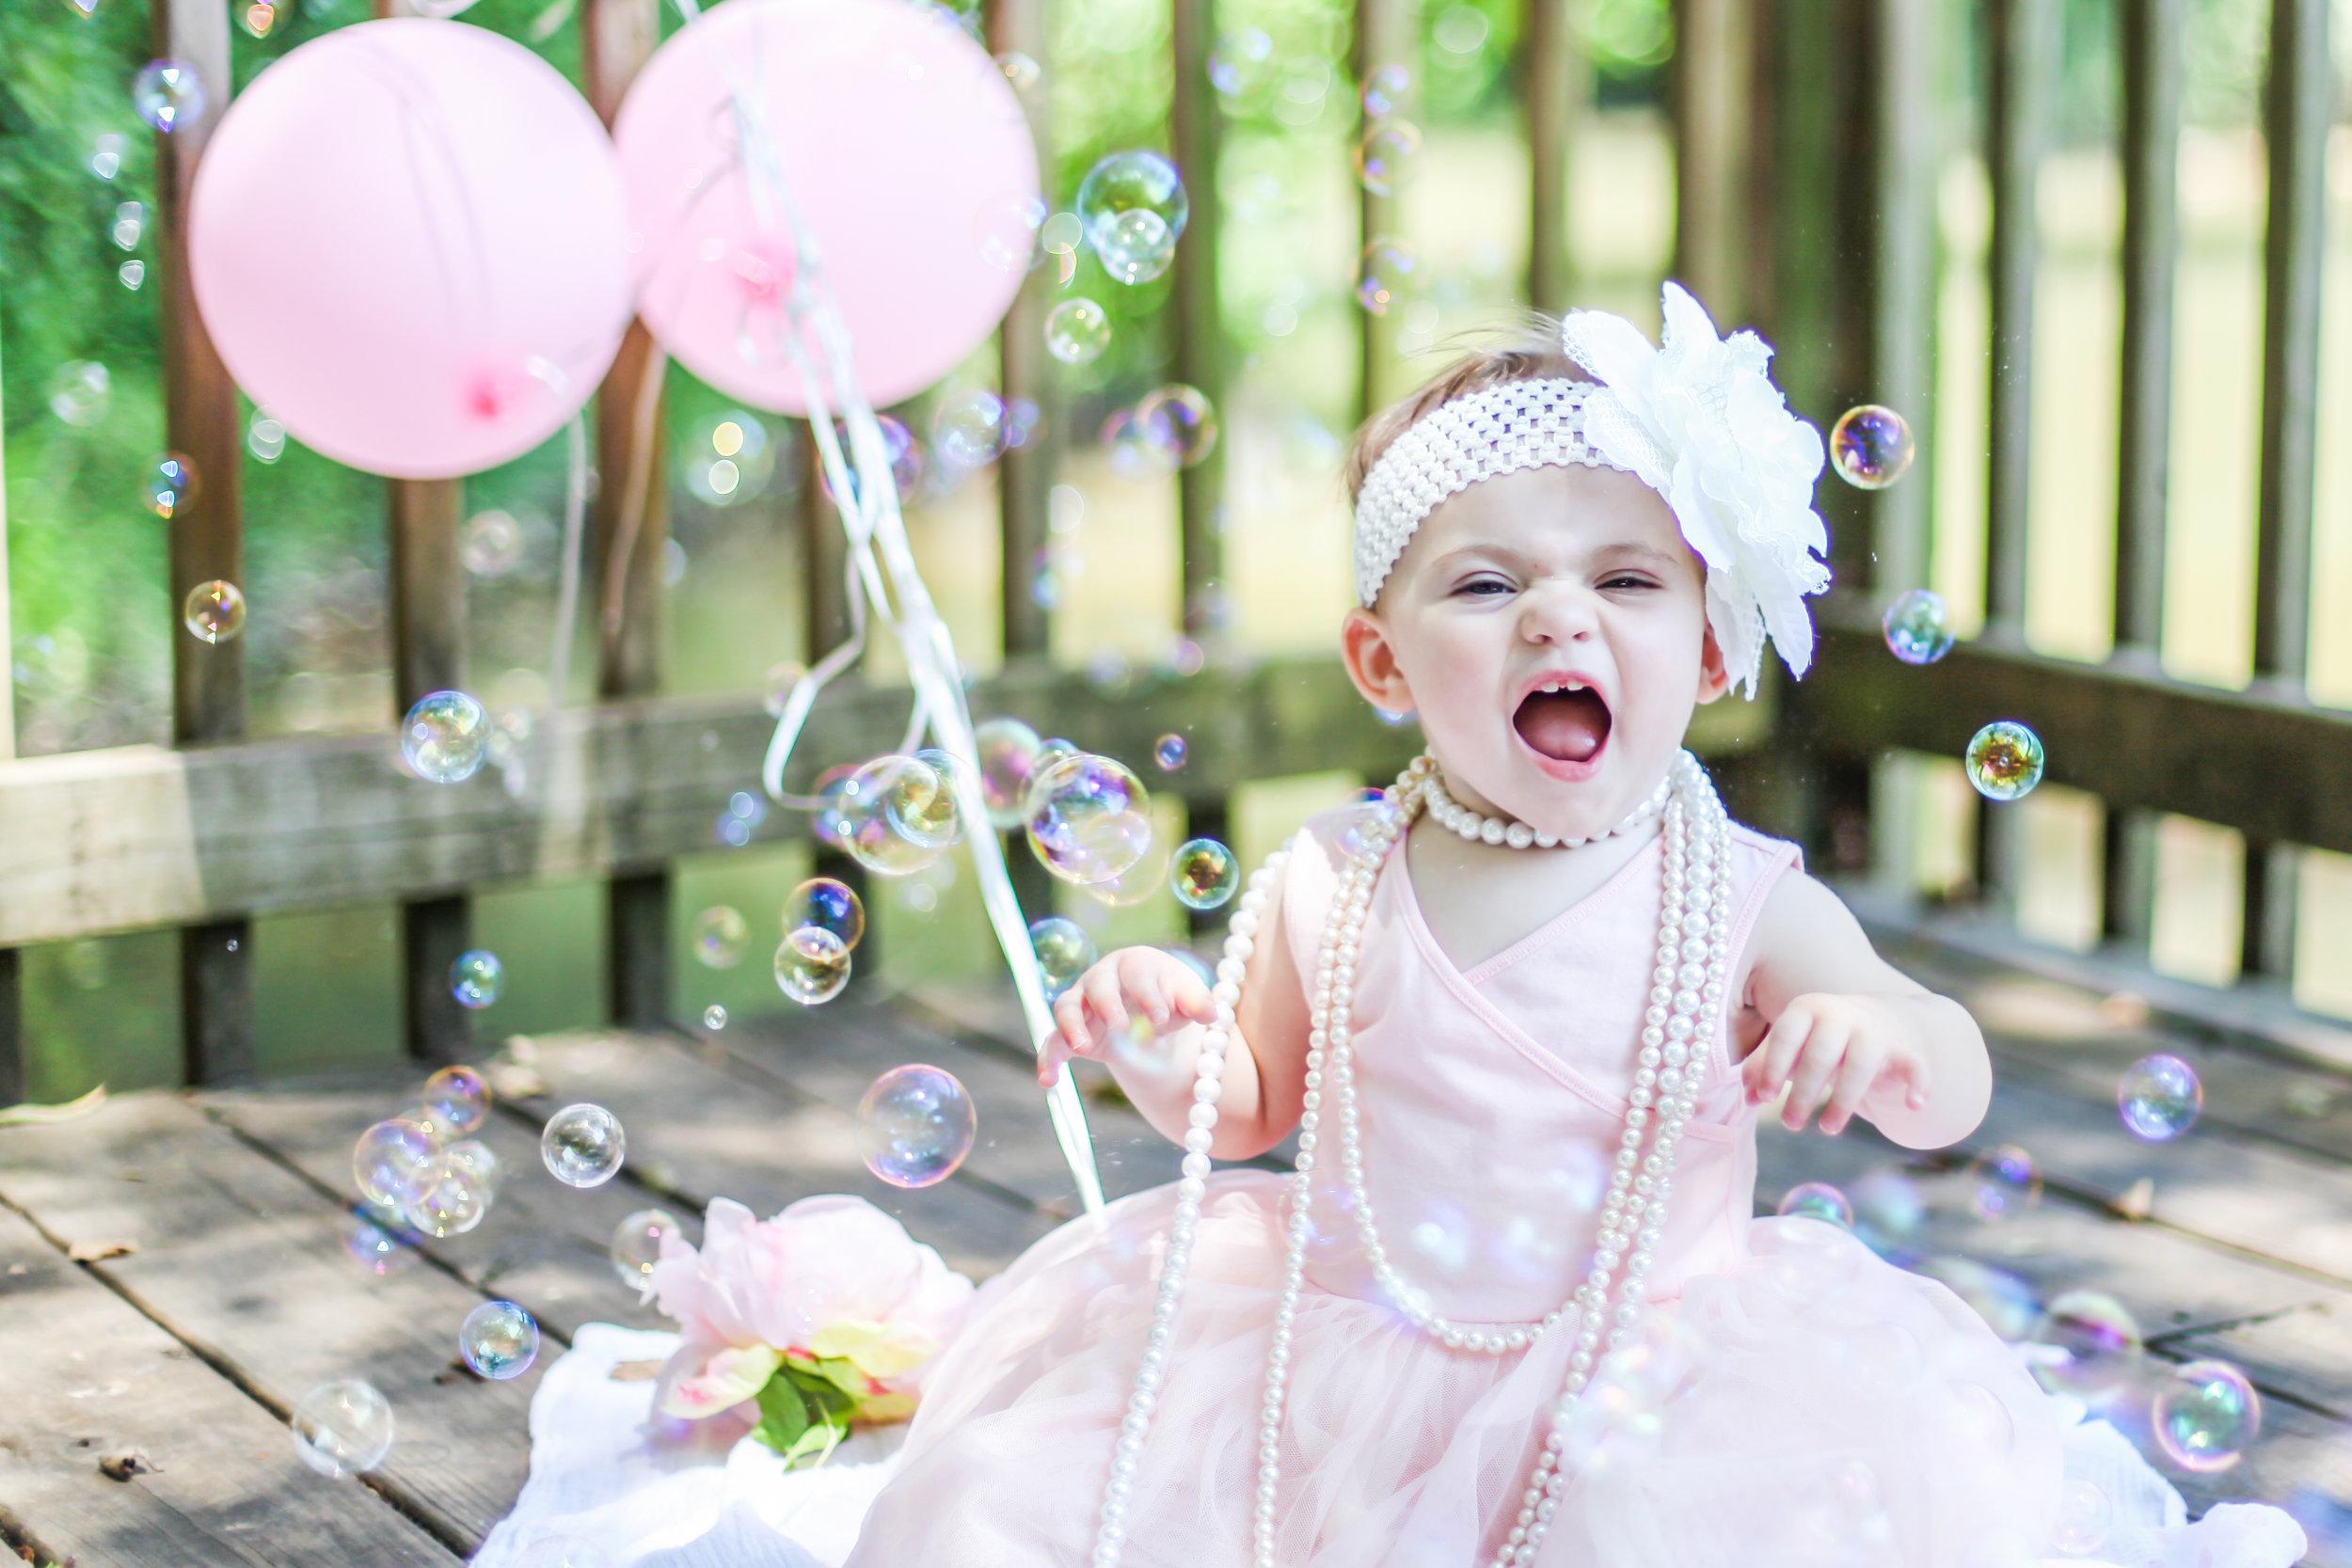 woodstock baby photography angela elliott-48.jpg